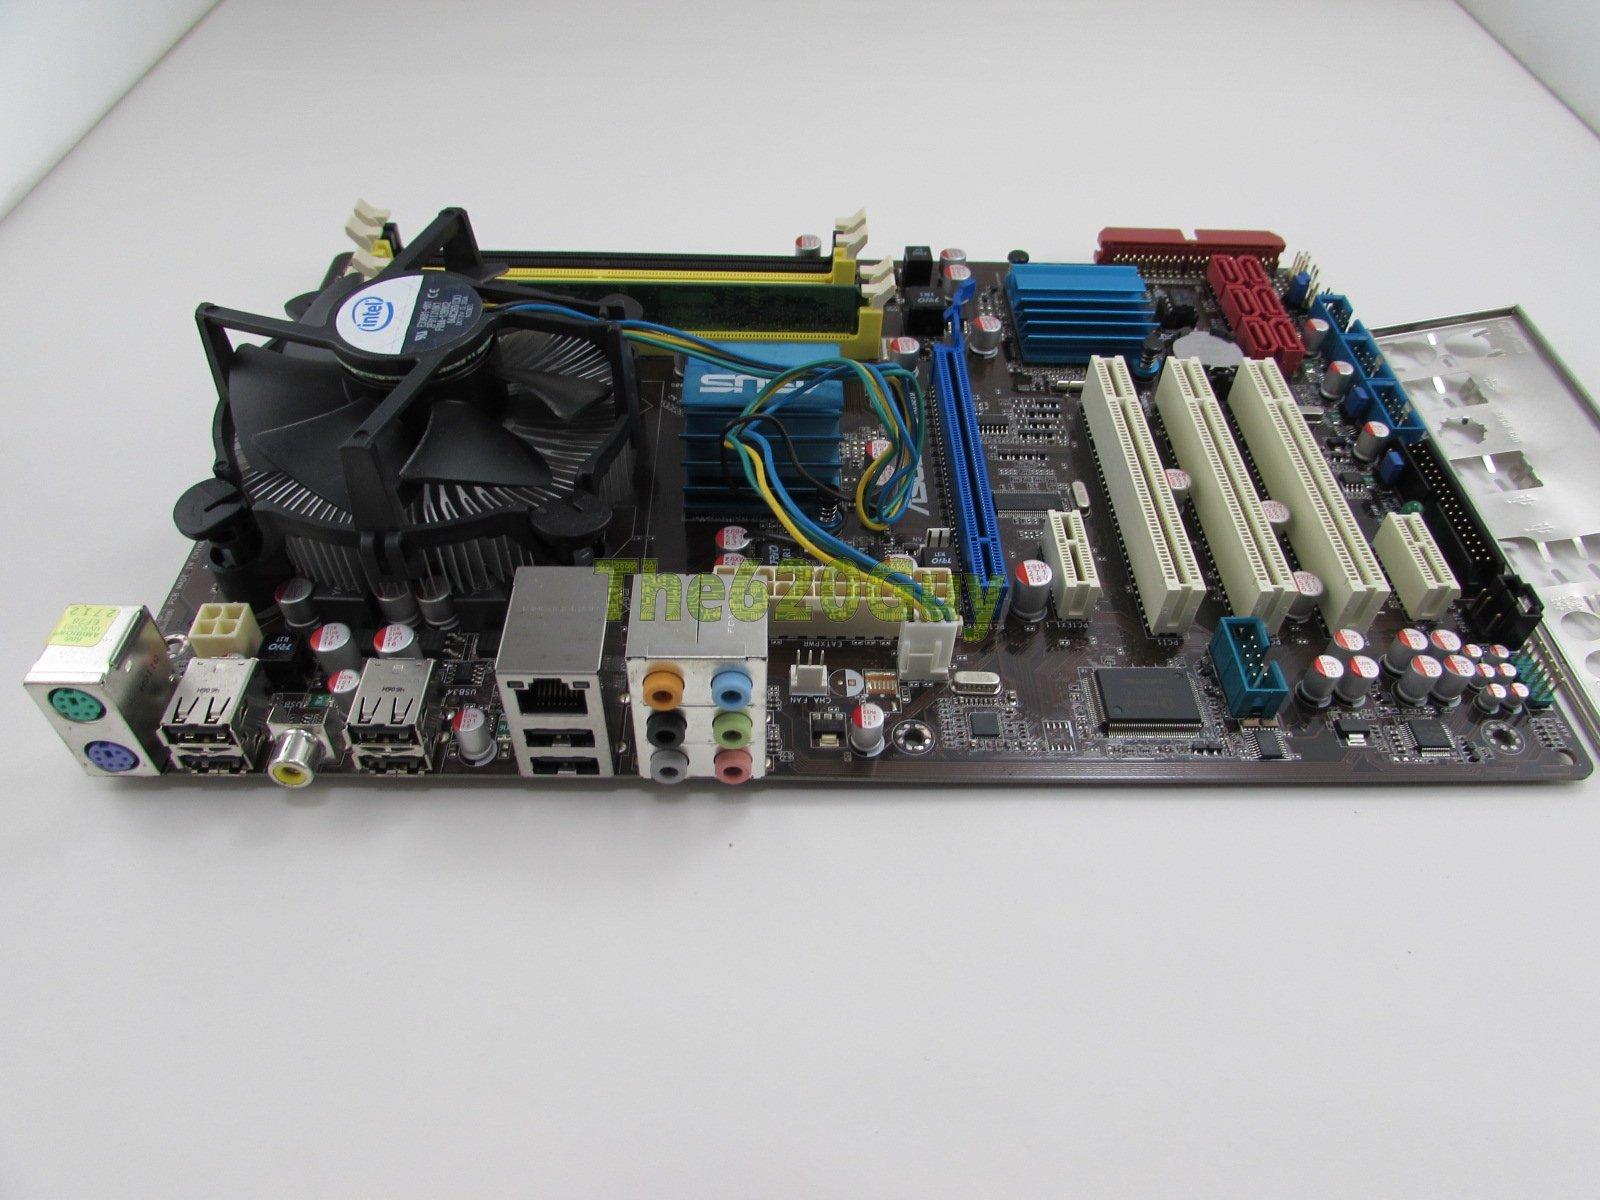 Pcie gigabit lan controller featuring ai net2